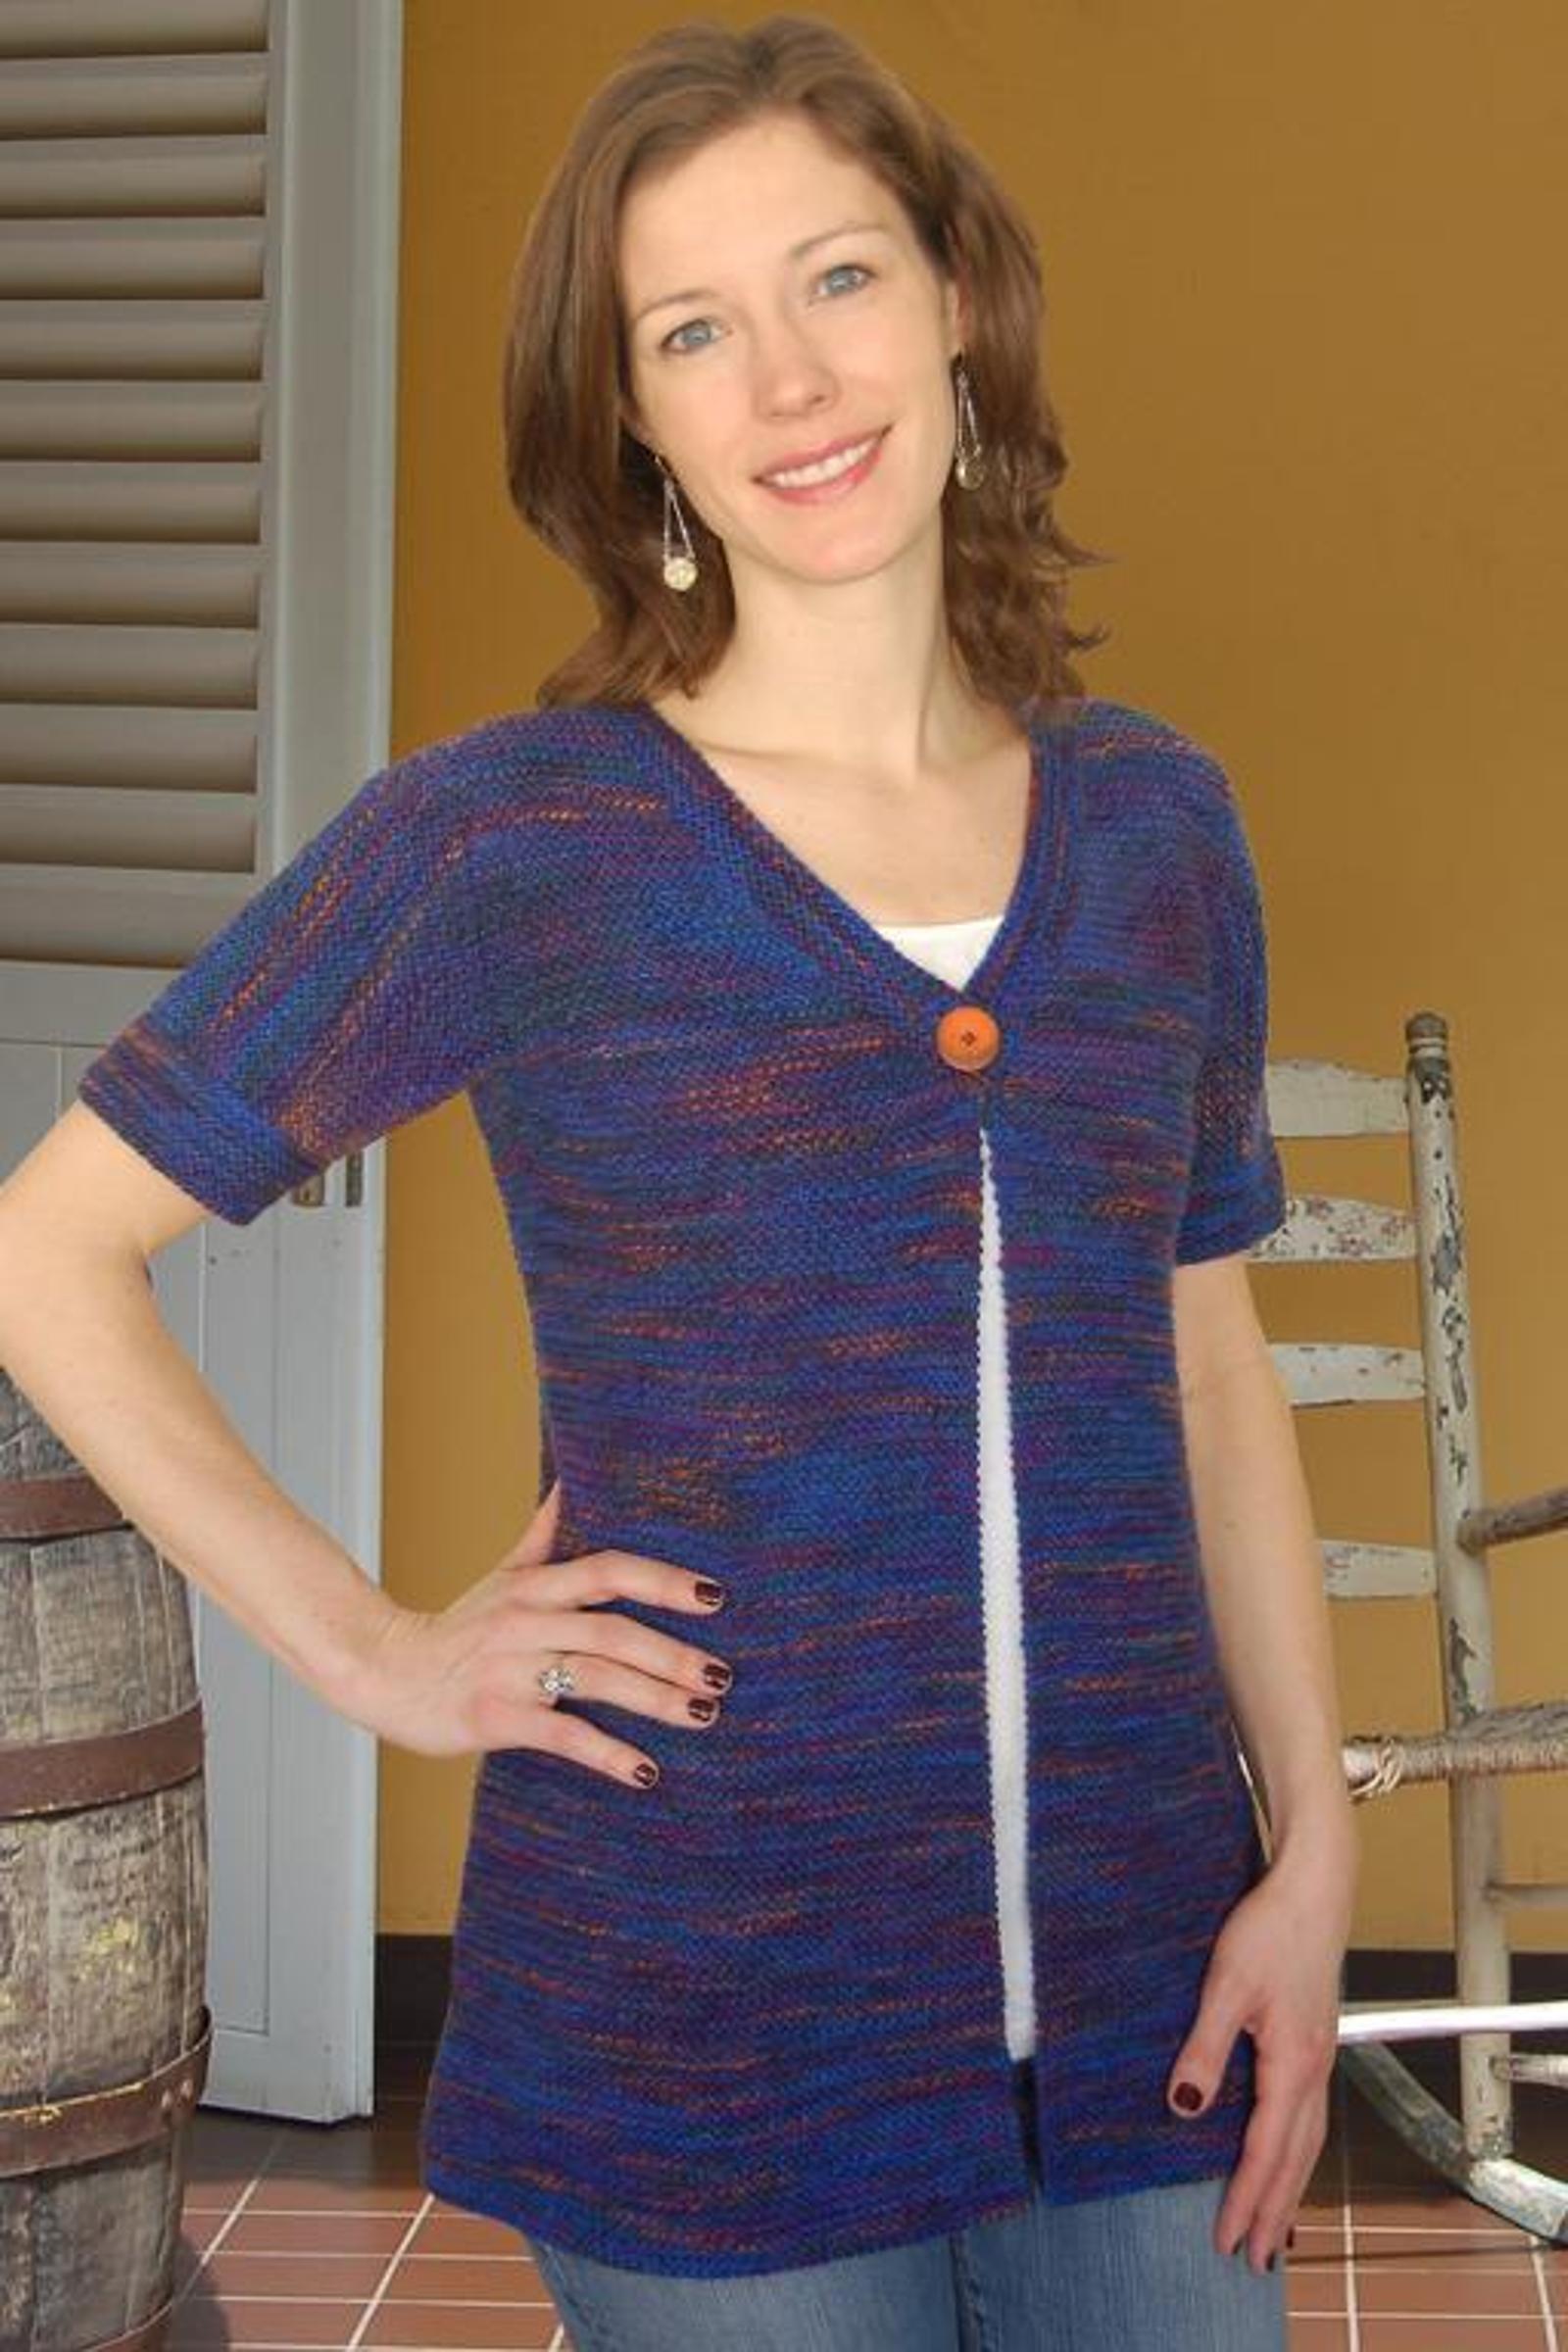 Starry Night Cardigan Knitting Pattern